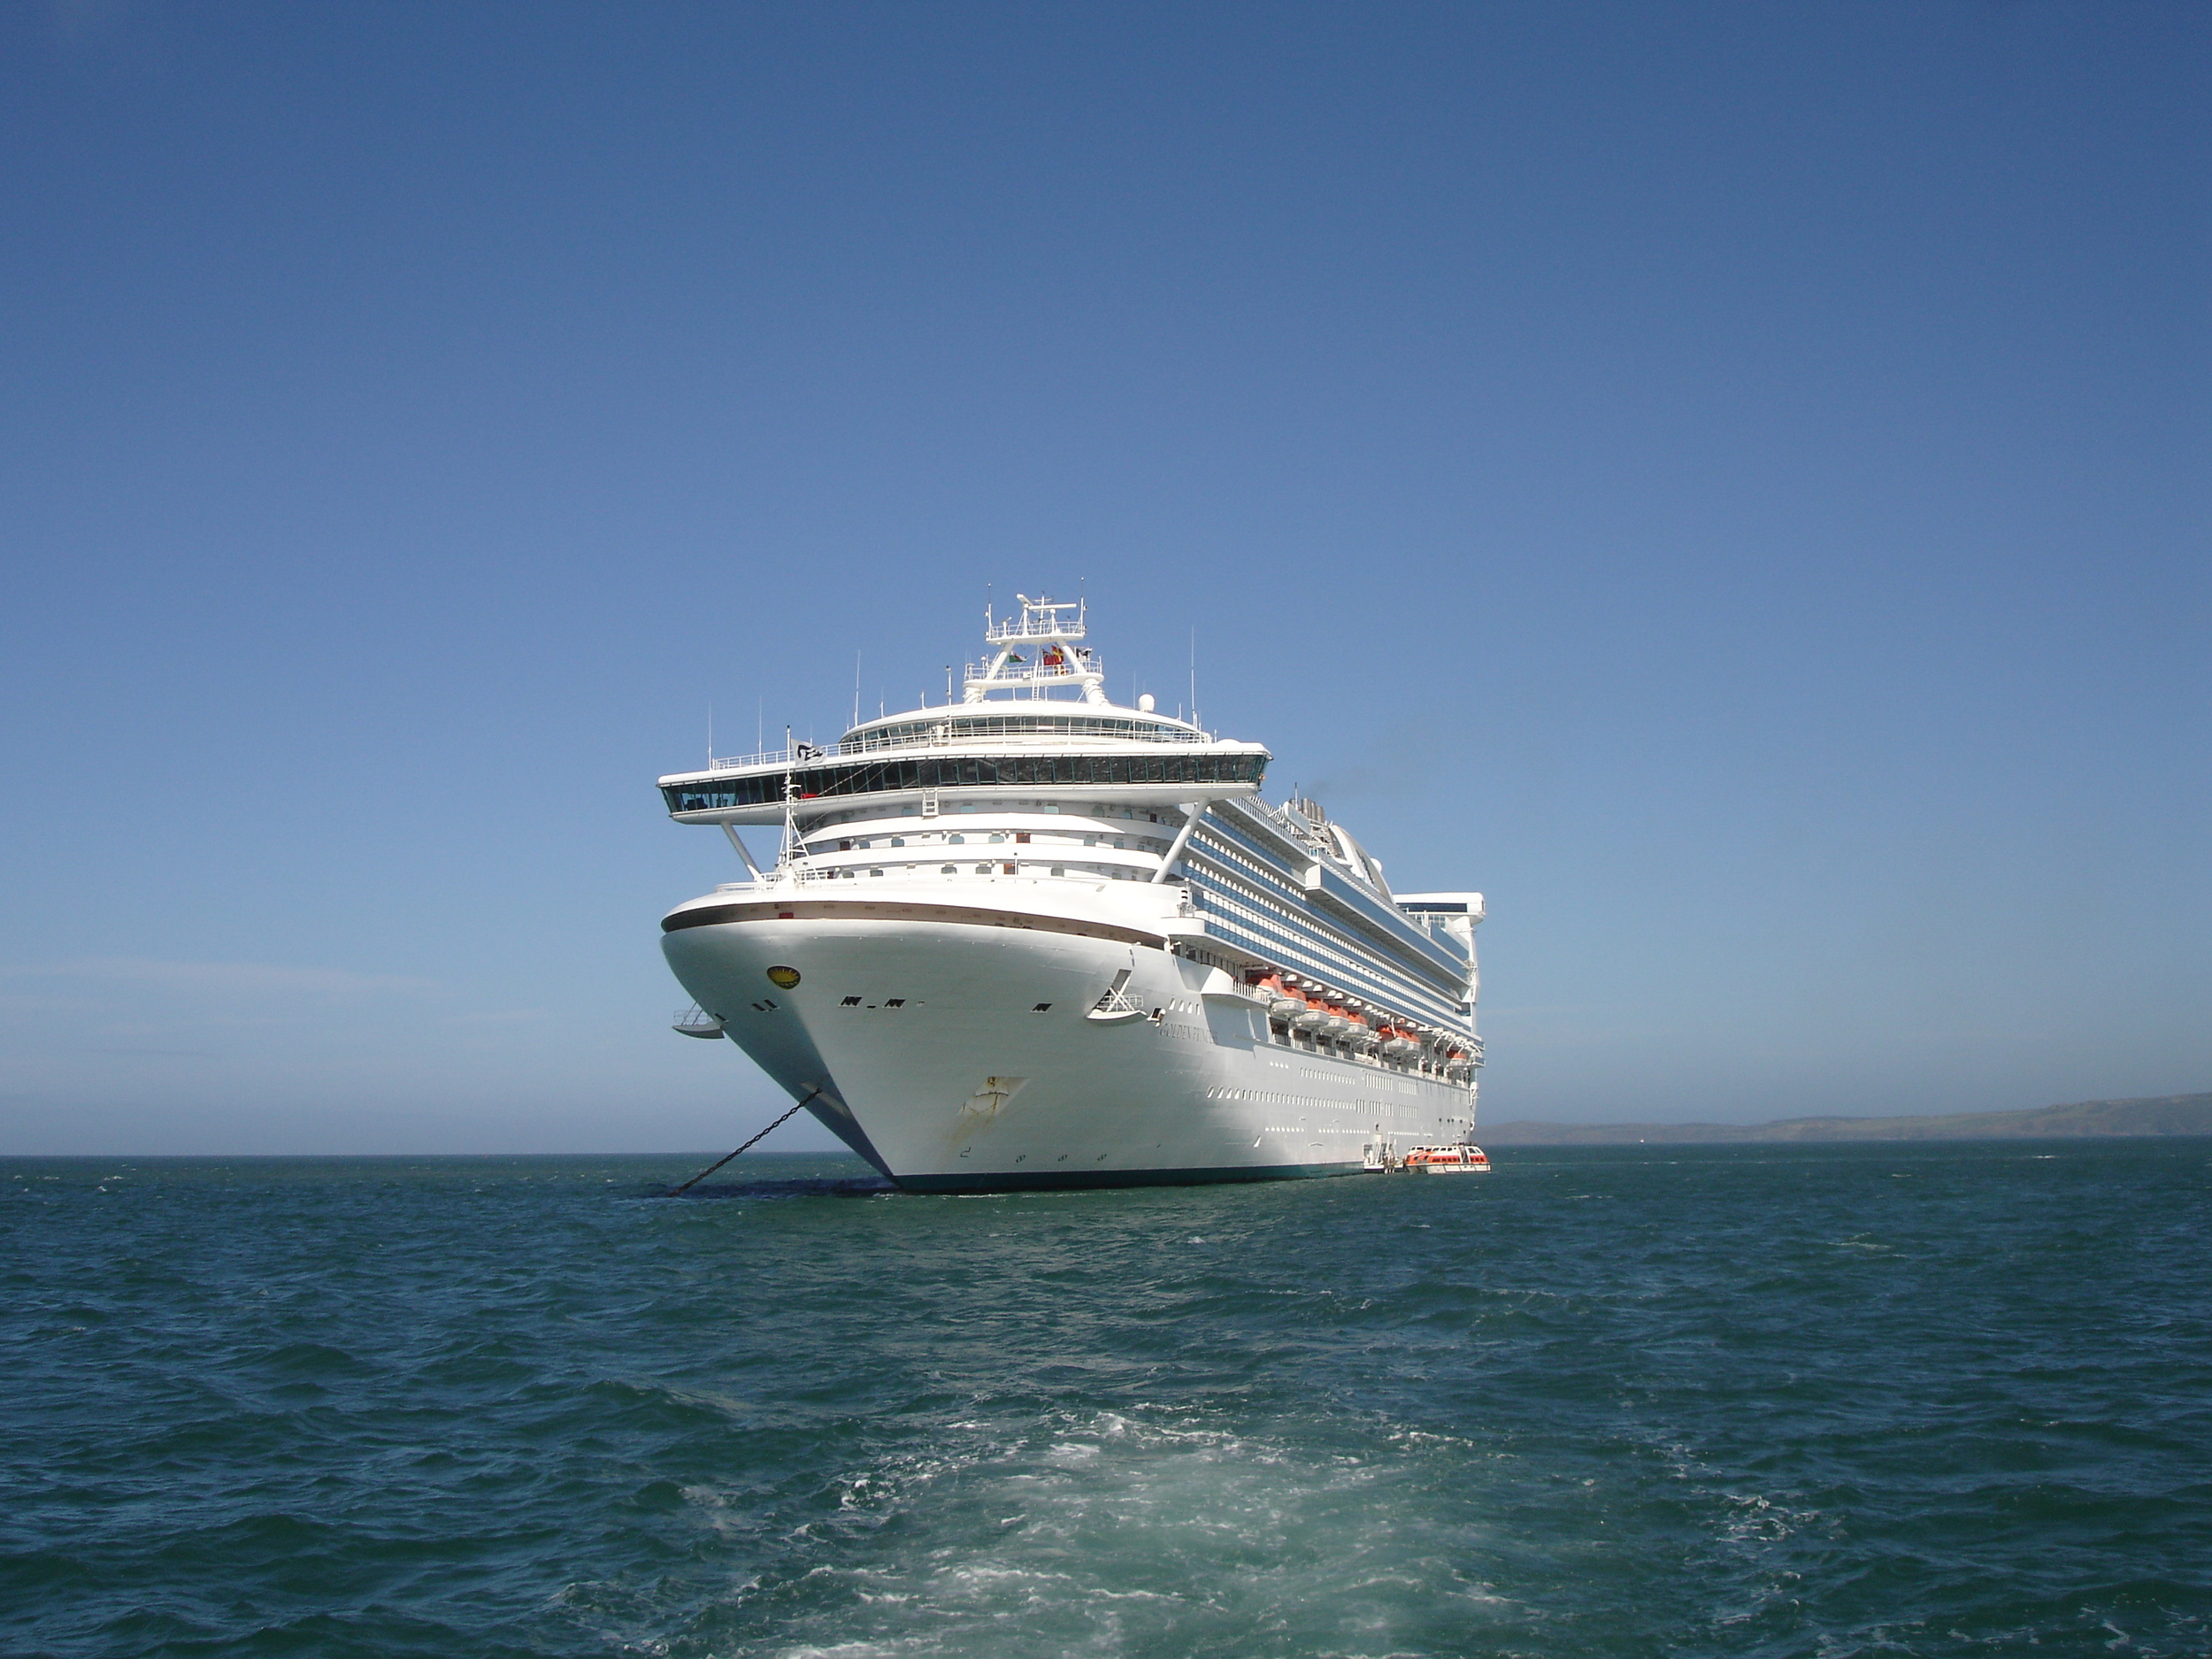 cruiseship_1409639_o.jpg